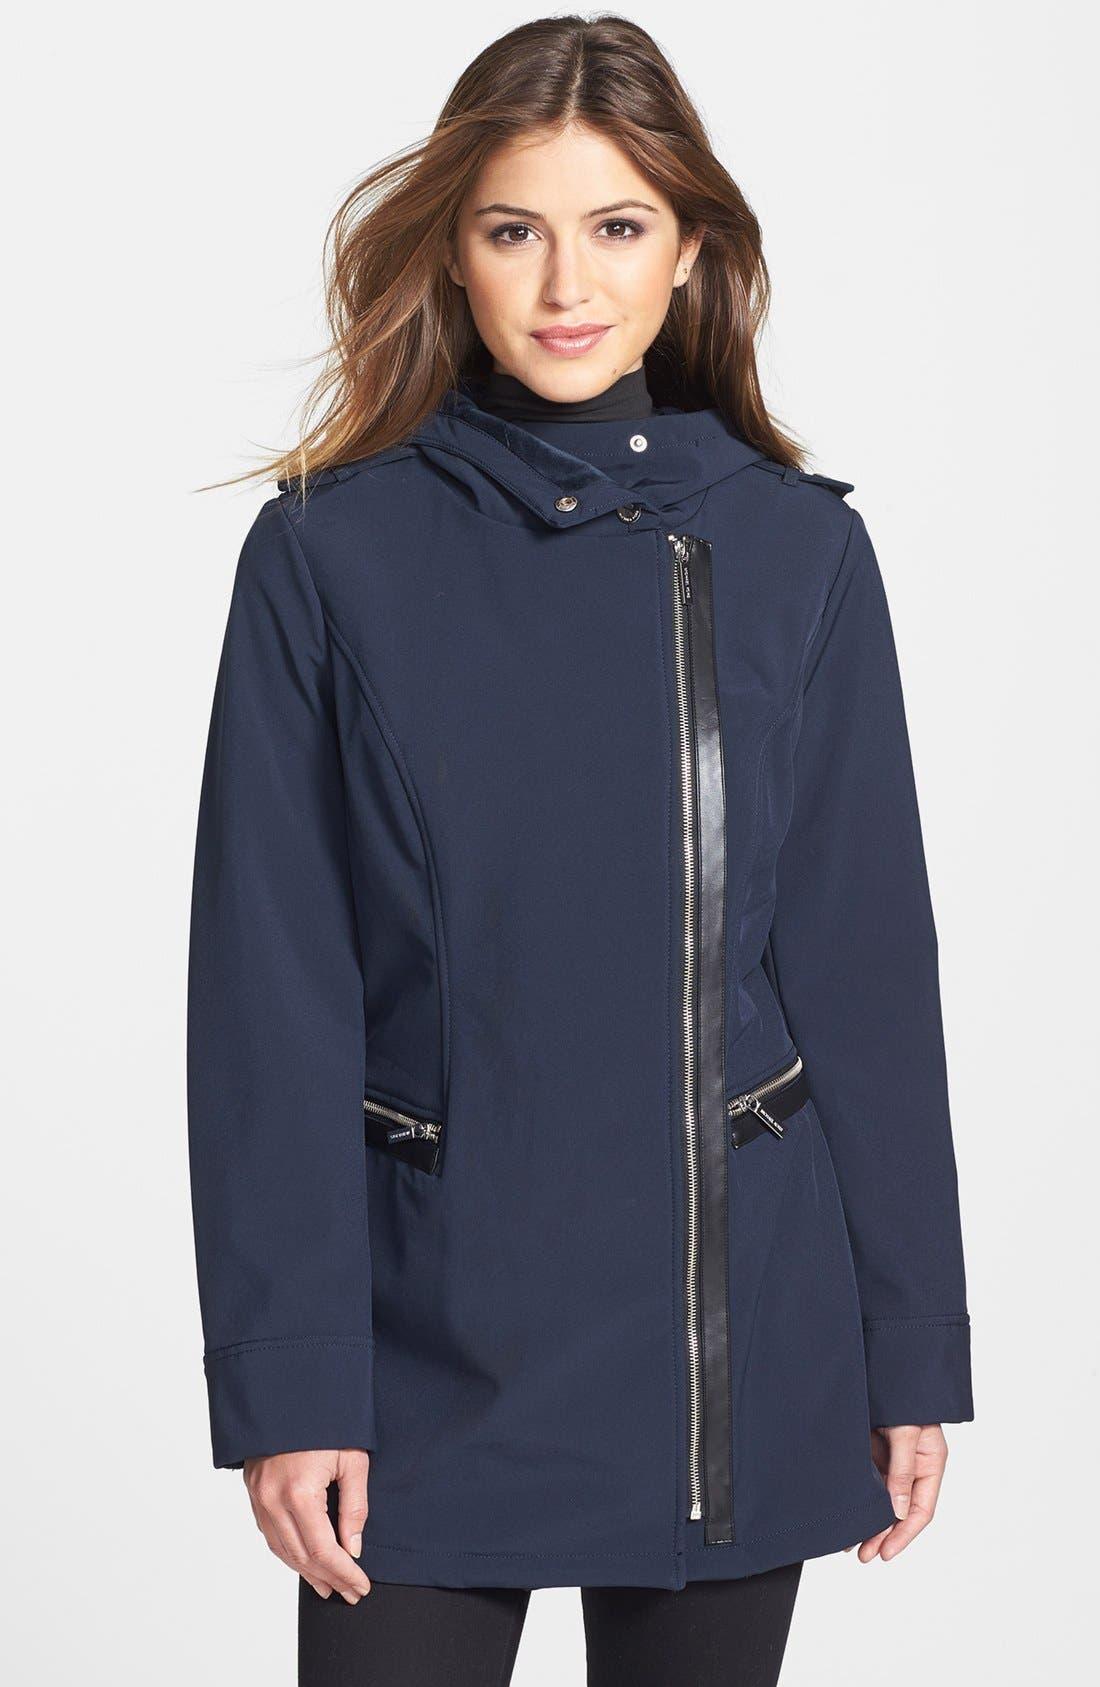 Main Image - MICHAEL Michael Kors Faux Leather Trim Soft Shell Jacket (Regular & Petite)